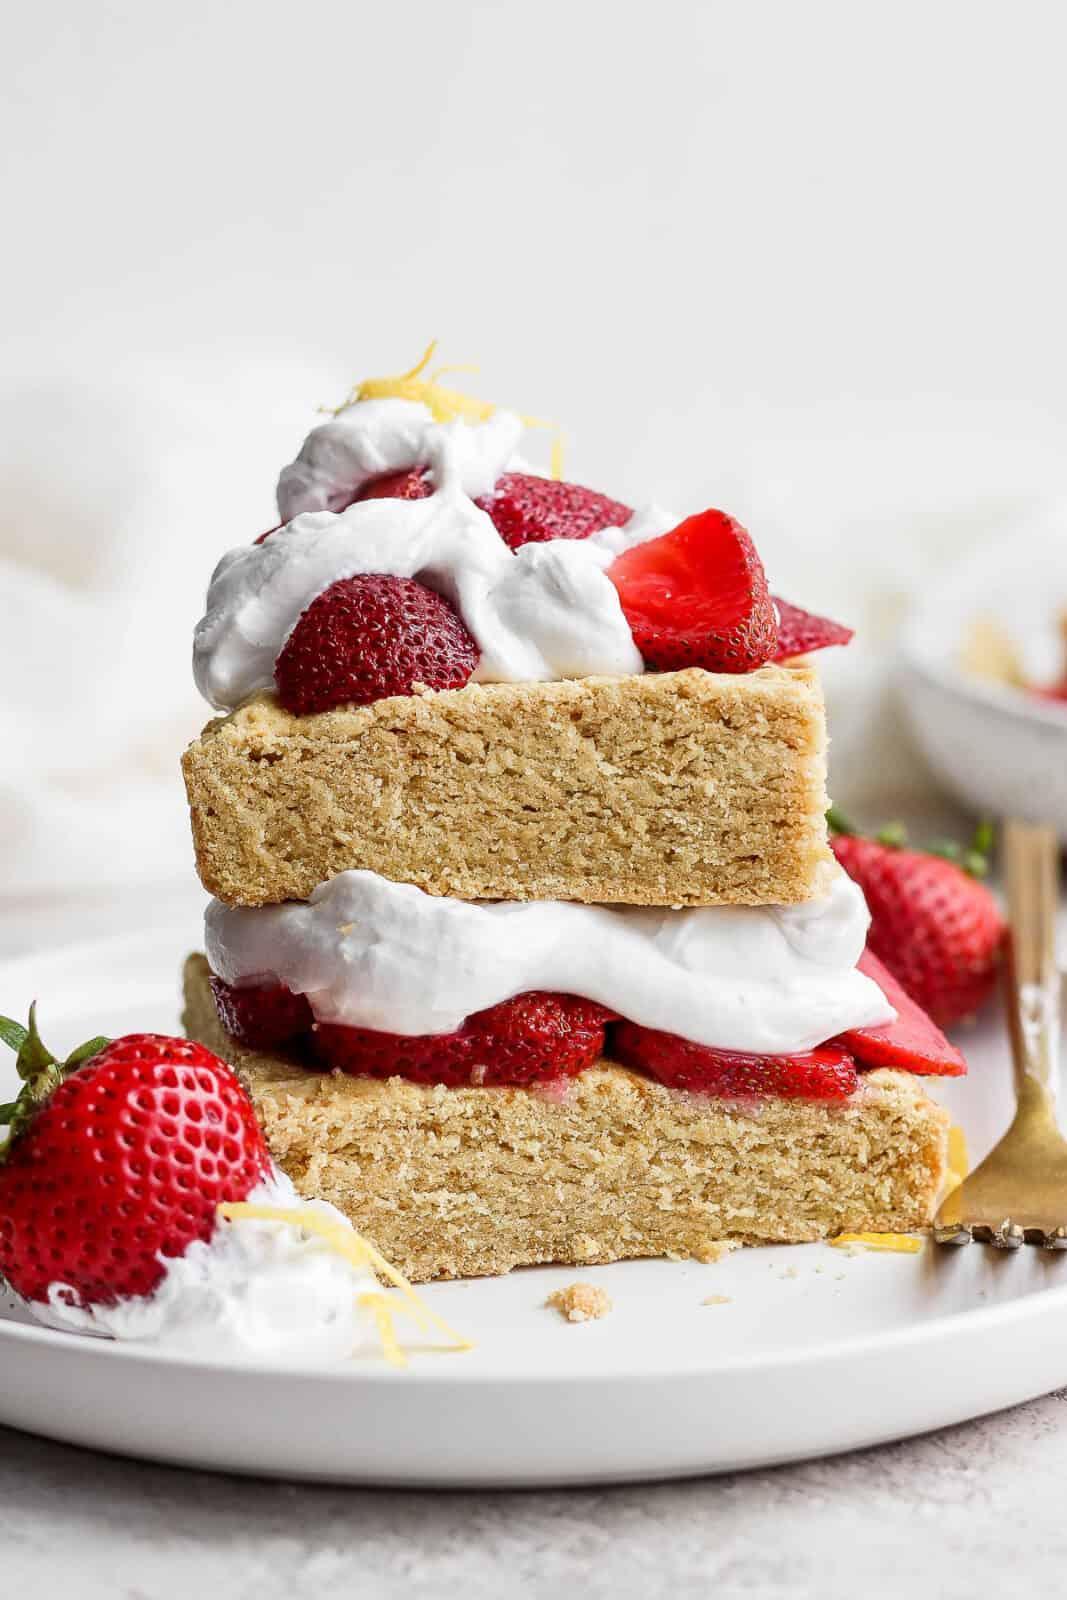 Plate of gluten free strawberry shortcake.